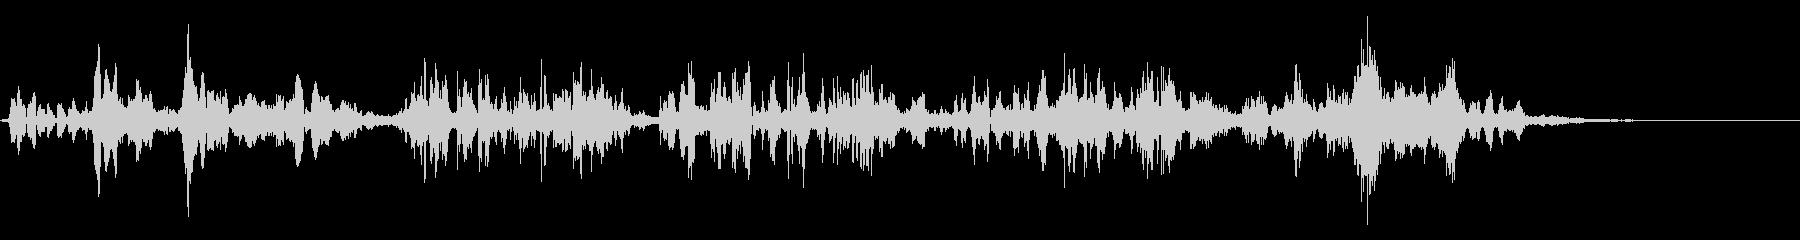 KANT 鳥のロボット声効果音3の未再生の波形